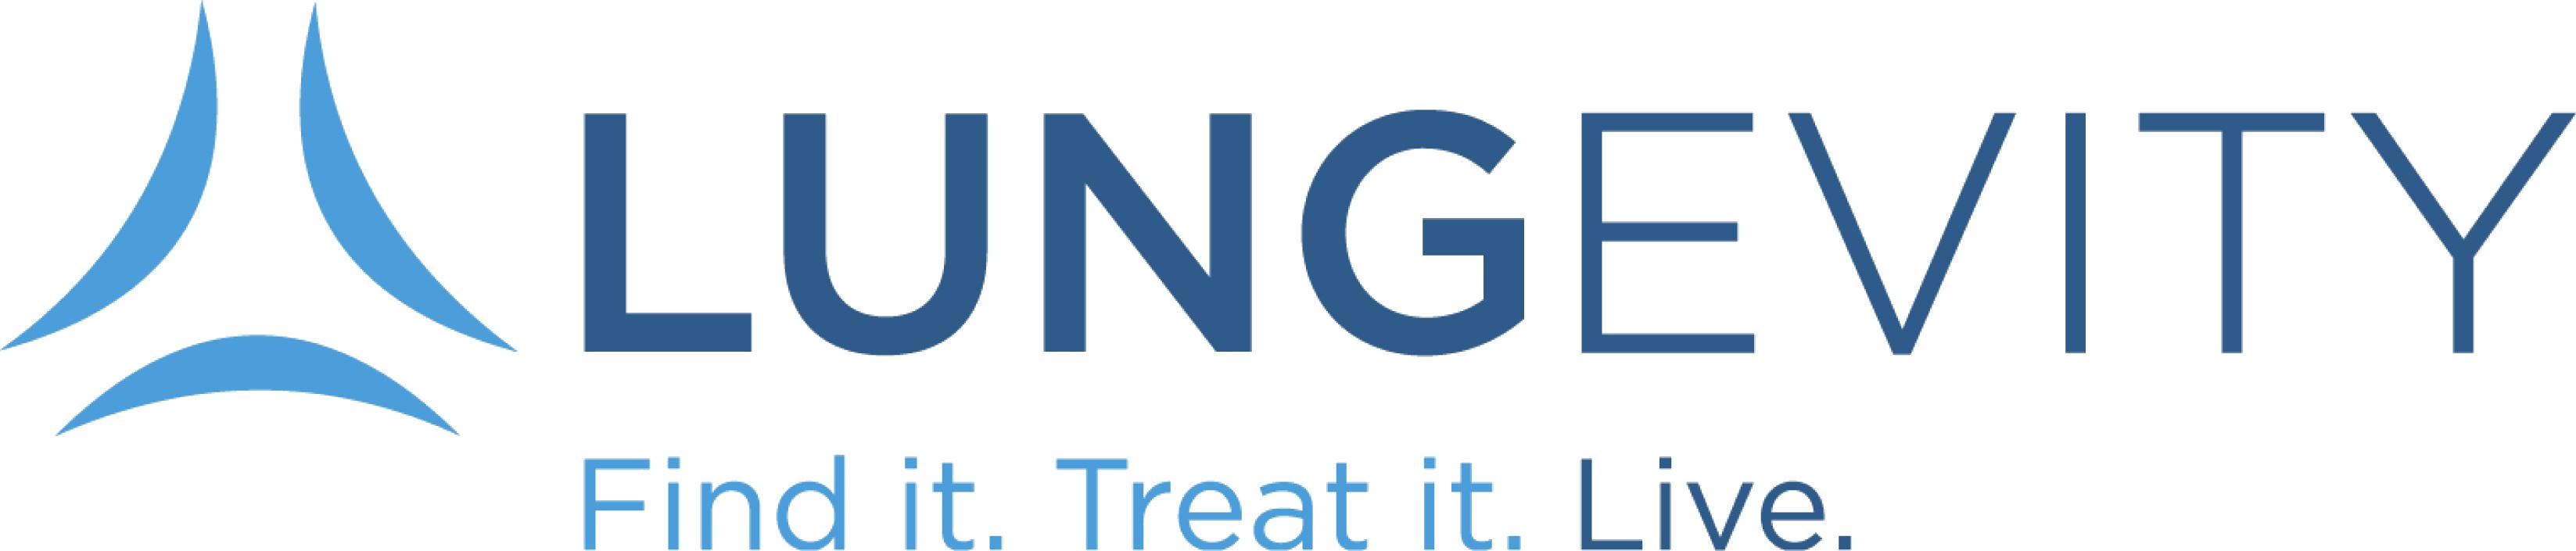 Lungevity logo